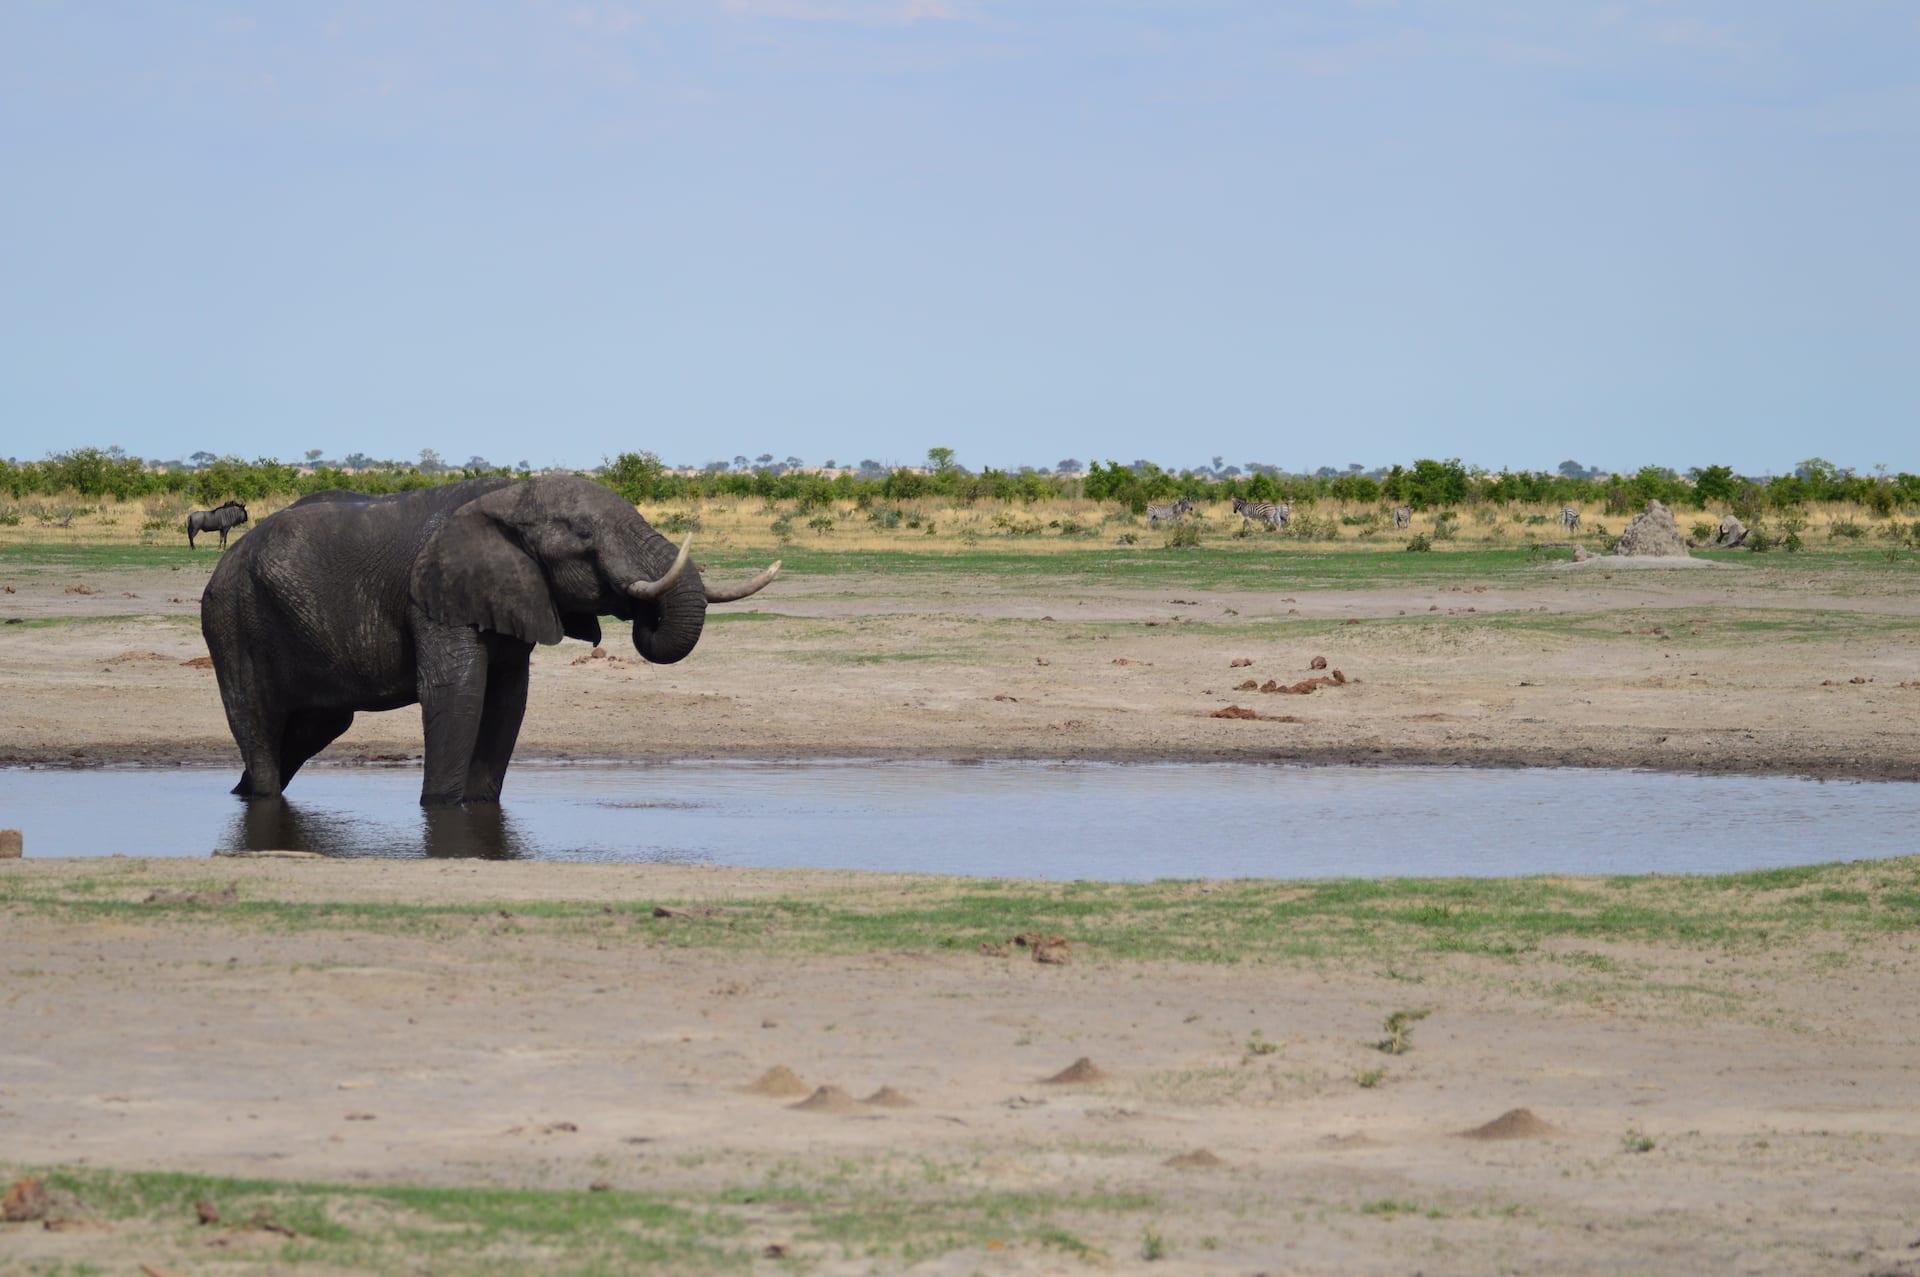 ALGEMEEN - BW - Savuti olifant bij waterplaats - BW 5